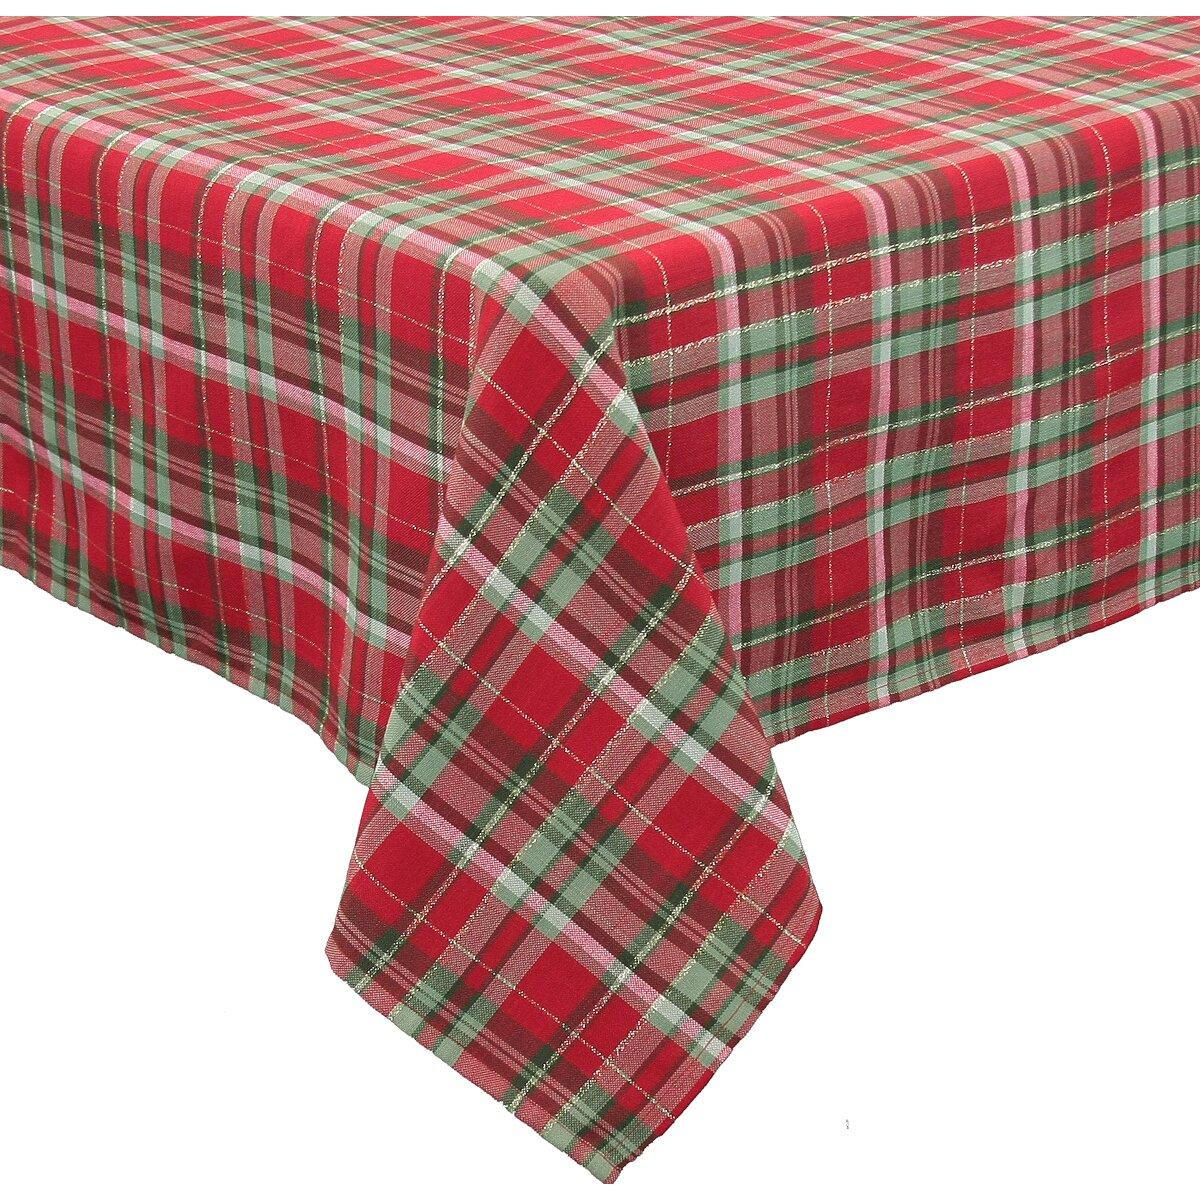 Xia Home Fashions Holiday Tartan Christmas Tablecloth ...